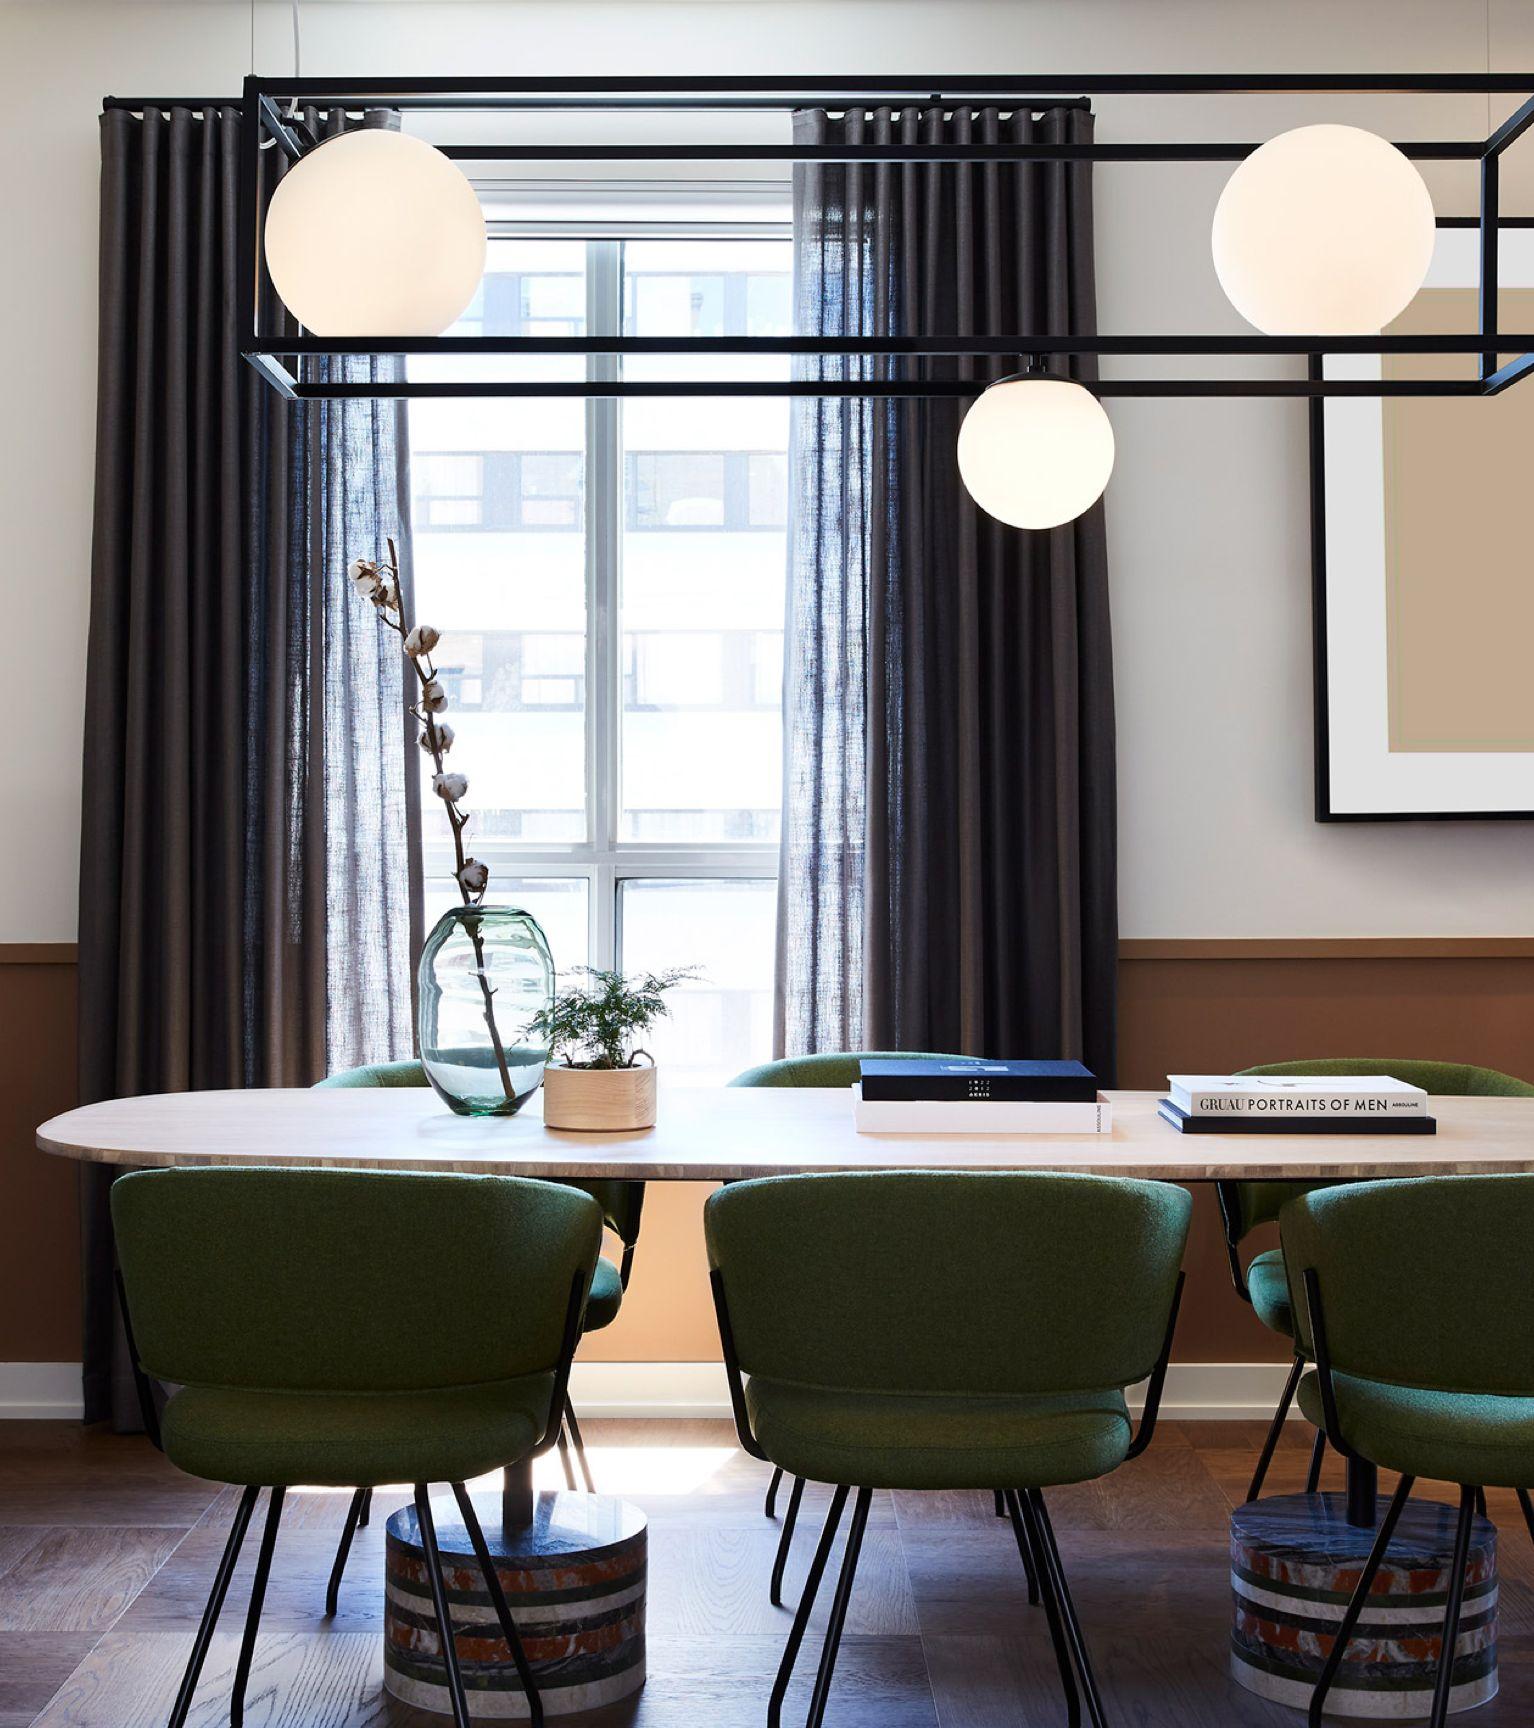 Modern hanging geometric chandelier in kitchen of Kimpton Hotel, Toronto, Canada